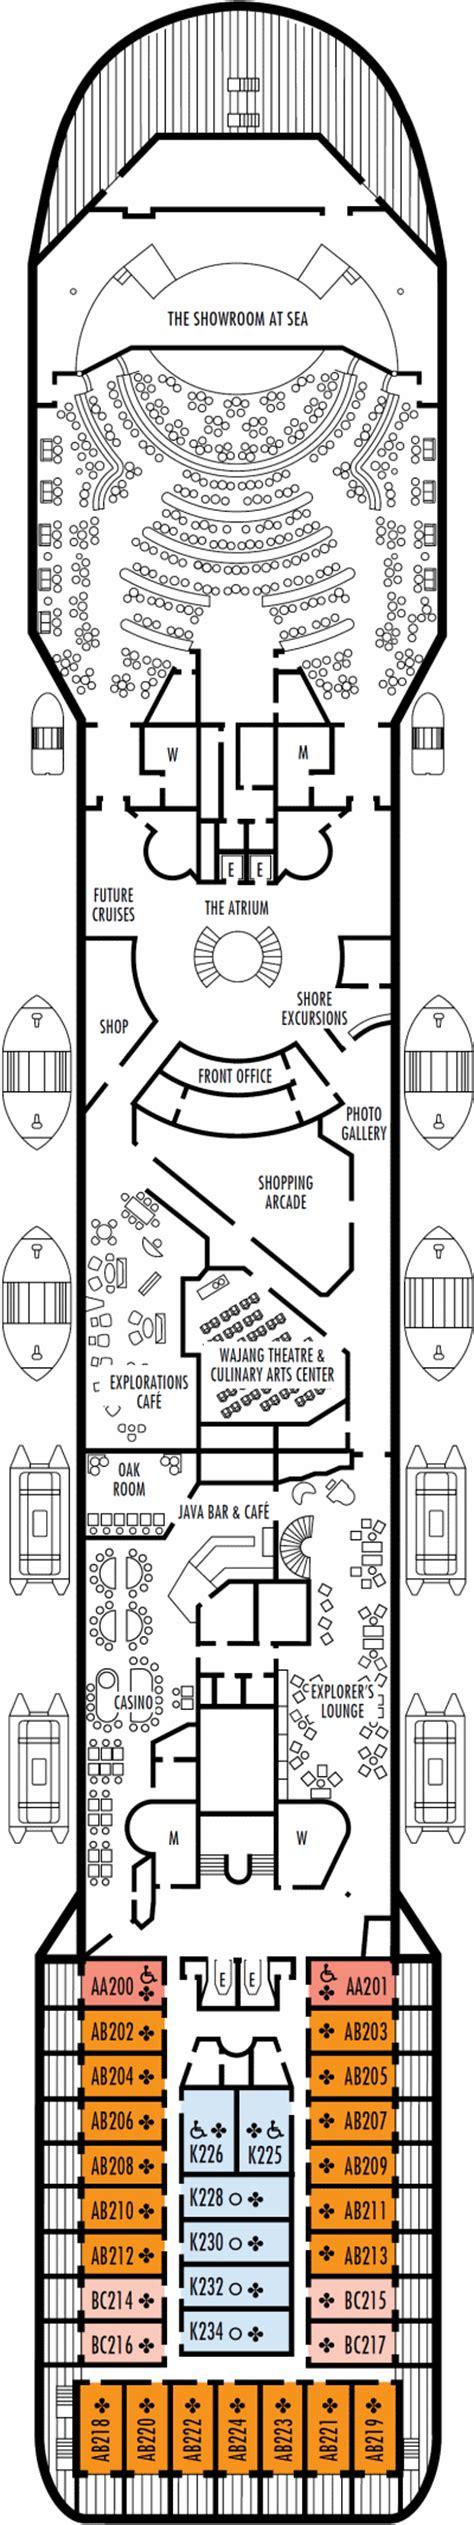 prinsendam deck plans